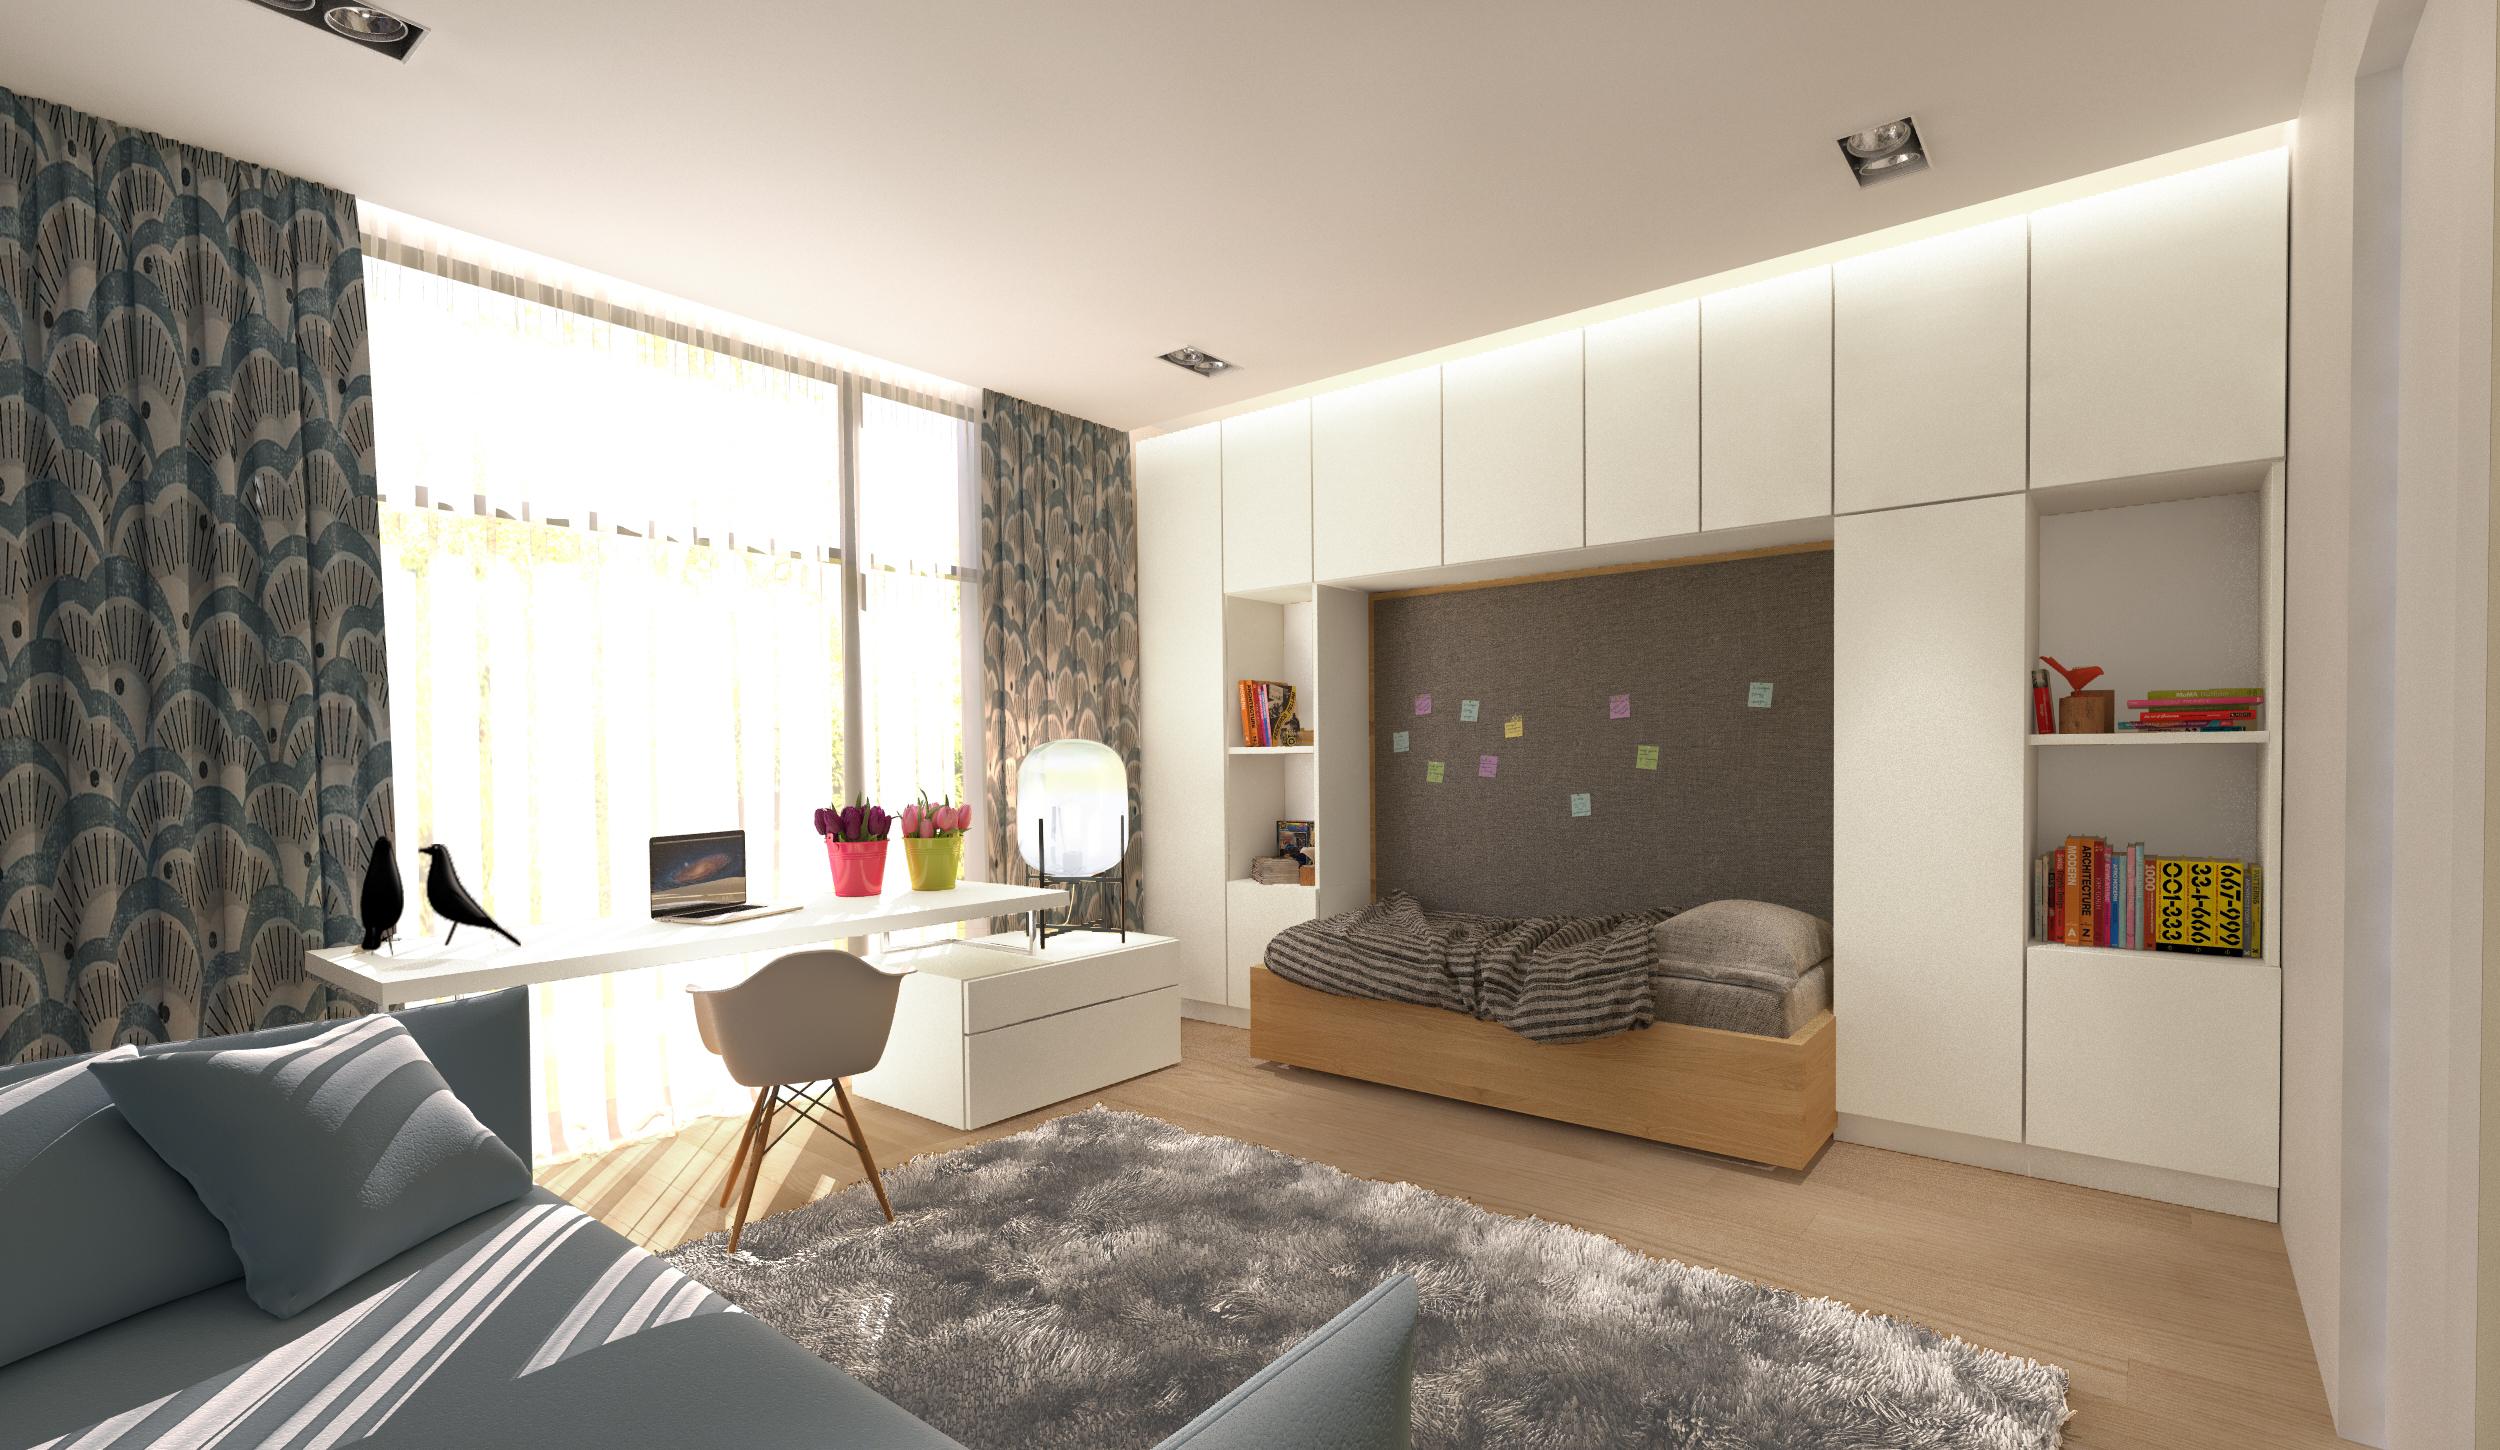 16_Match Architects_Барвиха_детская спальня.jpg